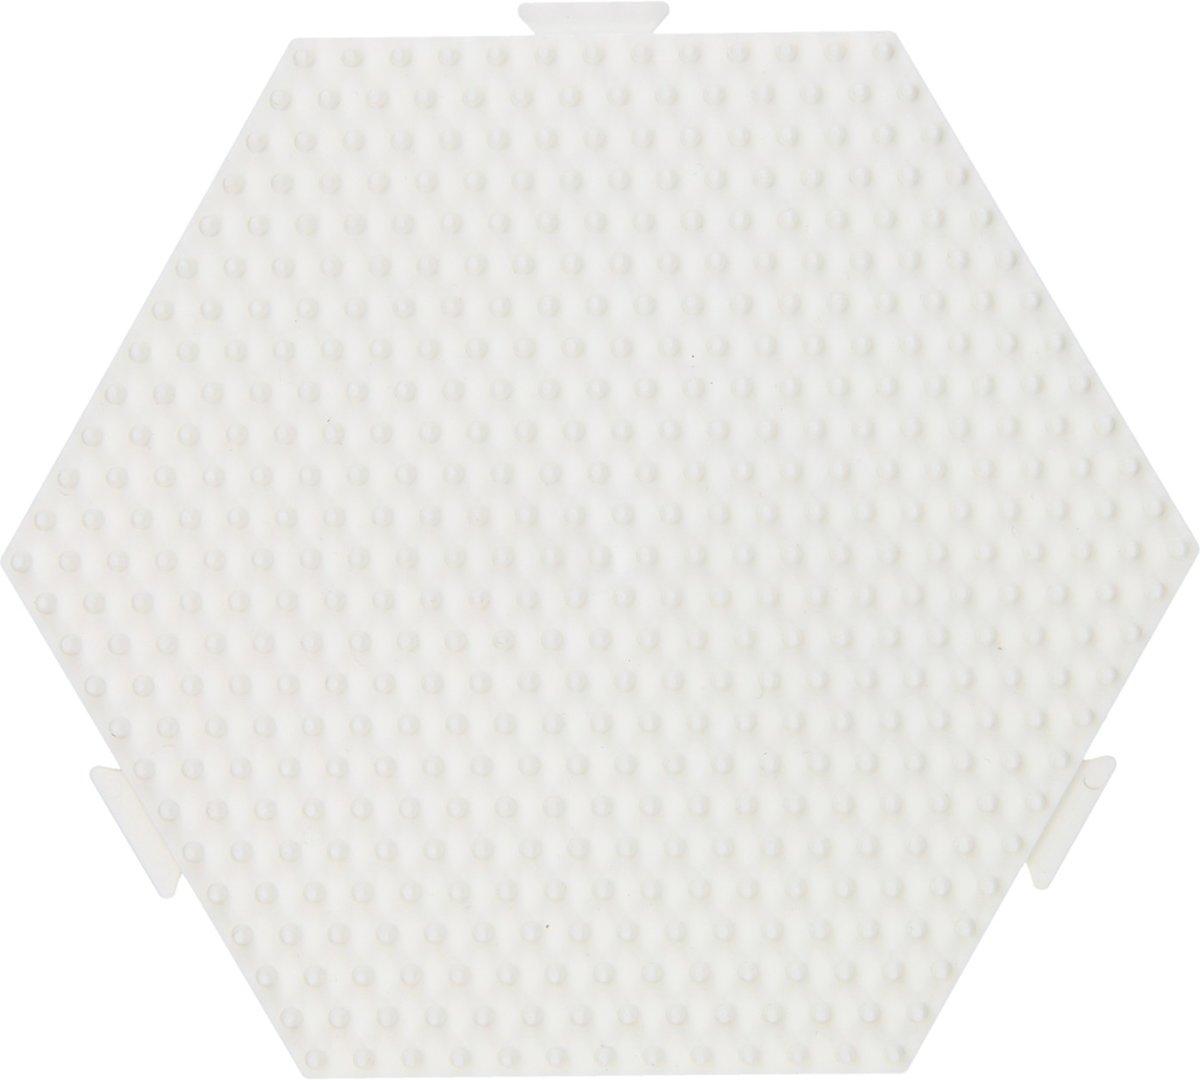 Hama Strijkkralenbordje - Zeshoek